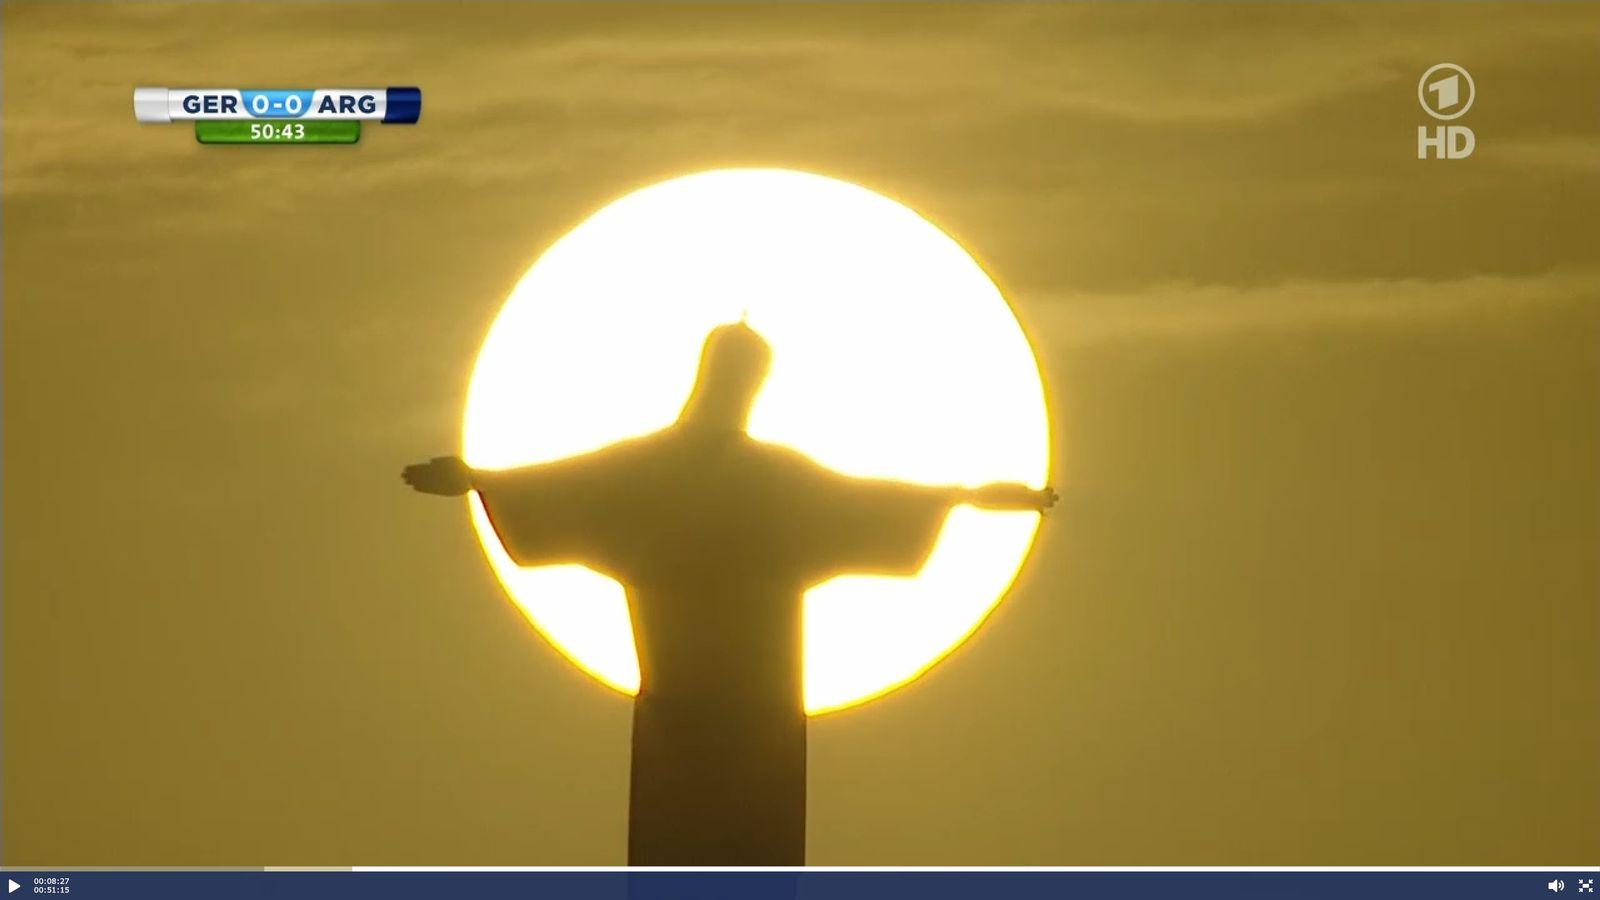 NUR ASL ZITAT Screenshot/ Rio/ The Redeemer